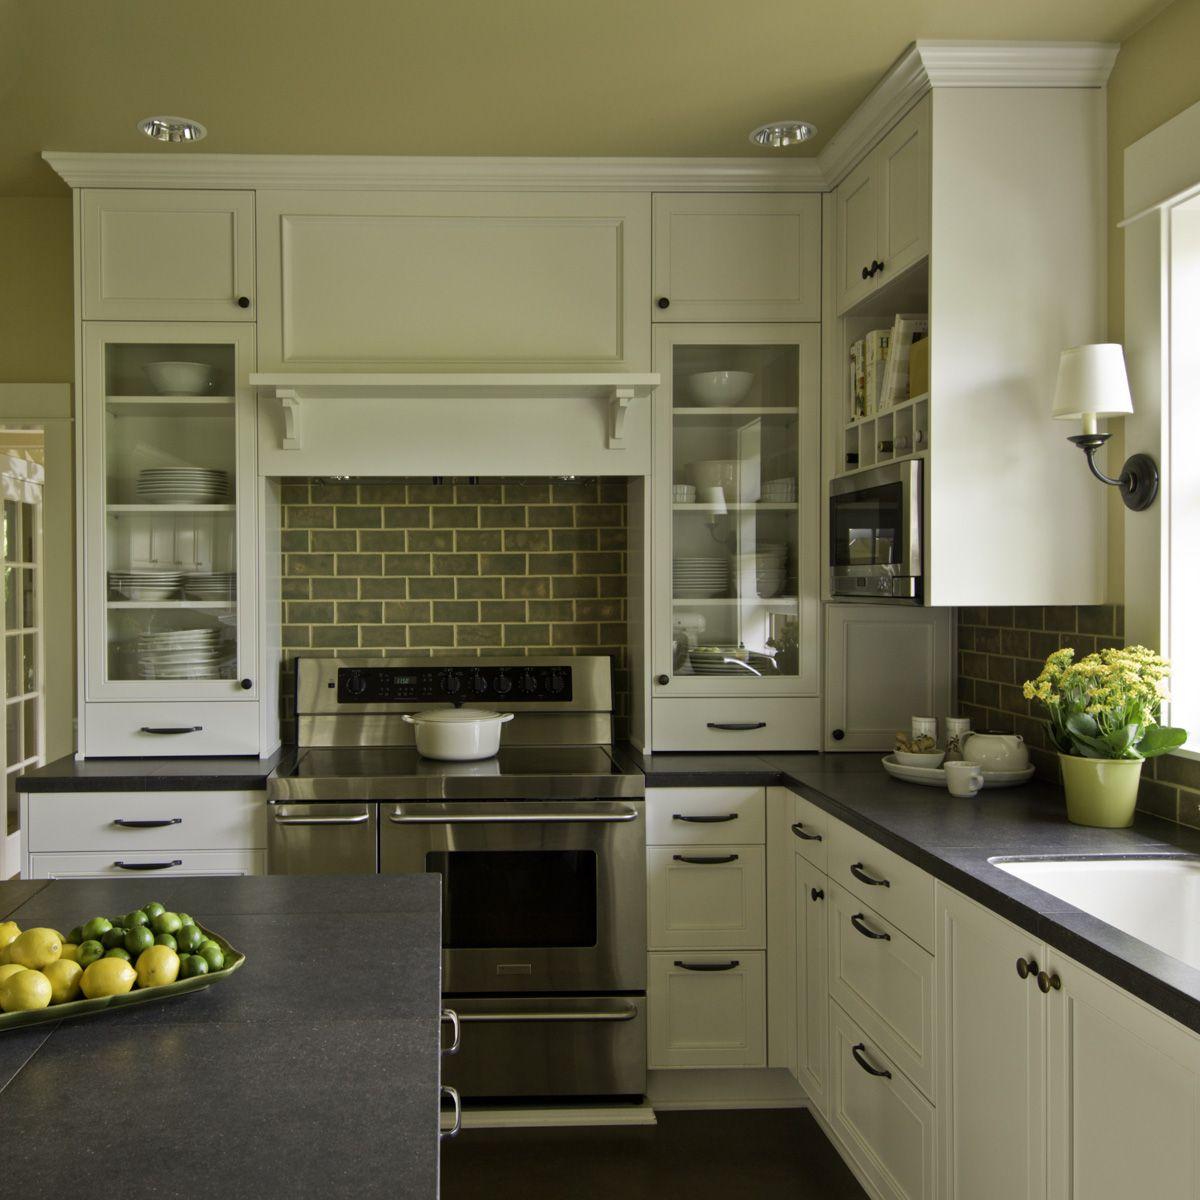 bungalow kitchen portland or | my future humble abode | pinterest